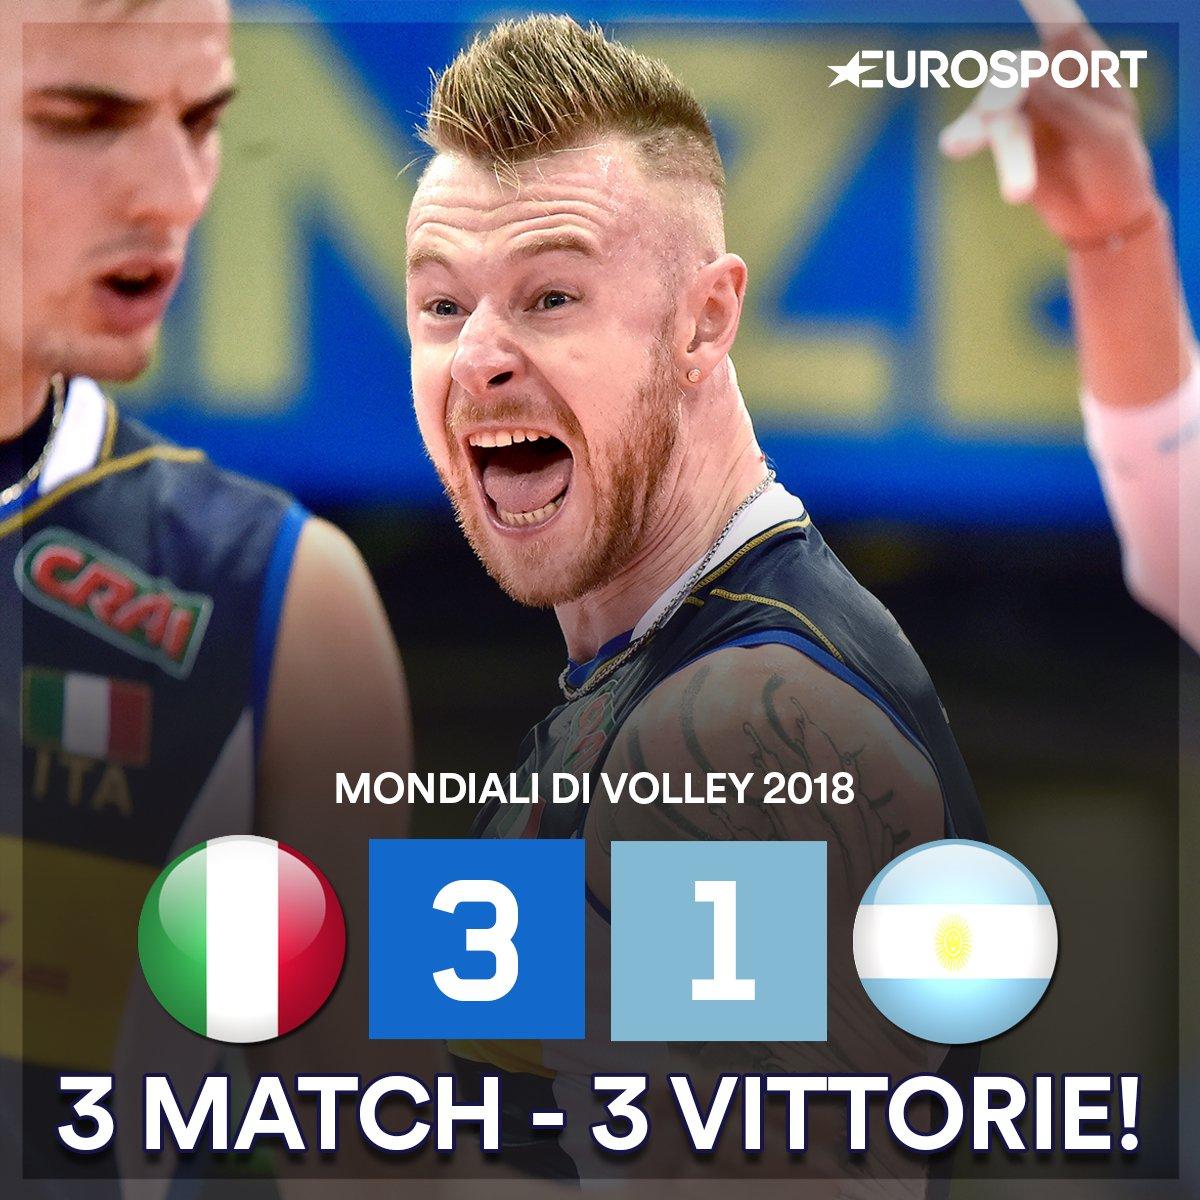 Regalate emozioni.Vi voglio bene ♥ #LaNazionale #ItaliaArgentina #FIVBmensWCH#Italia #Italy #ita #volley #VolleyMondiali18 #volleyballWCHs #volleyworldfantagalli  #LaNazionale #IZ9 #Pallavolo #mondiali #16settembre #Zaytsev #ivanzaytsev  - Ukustom